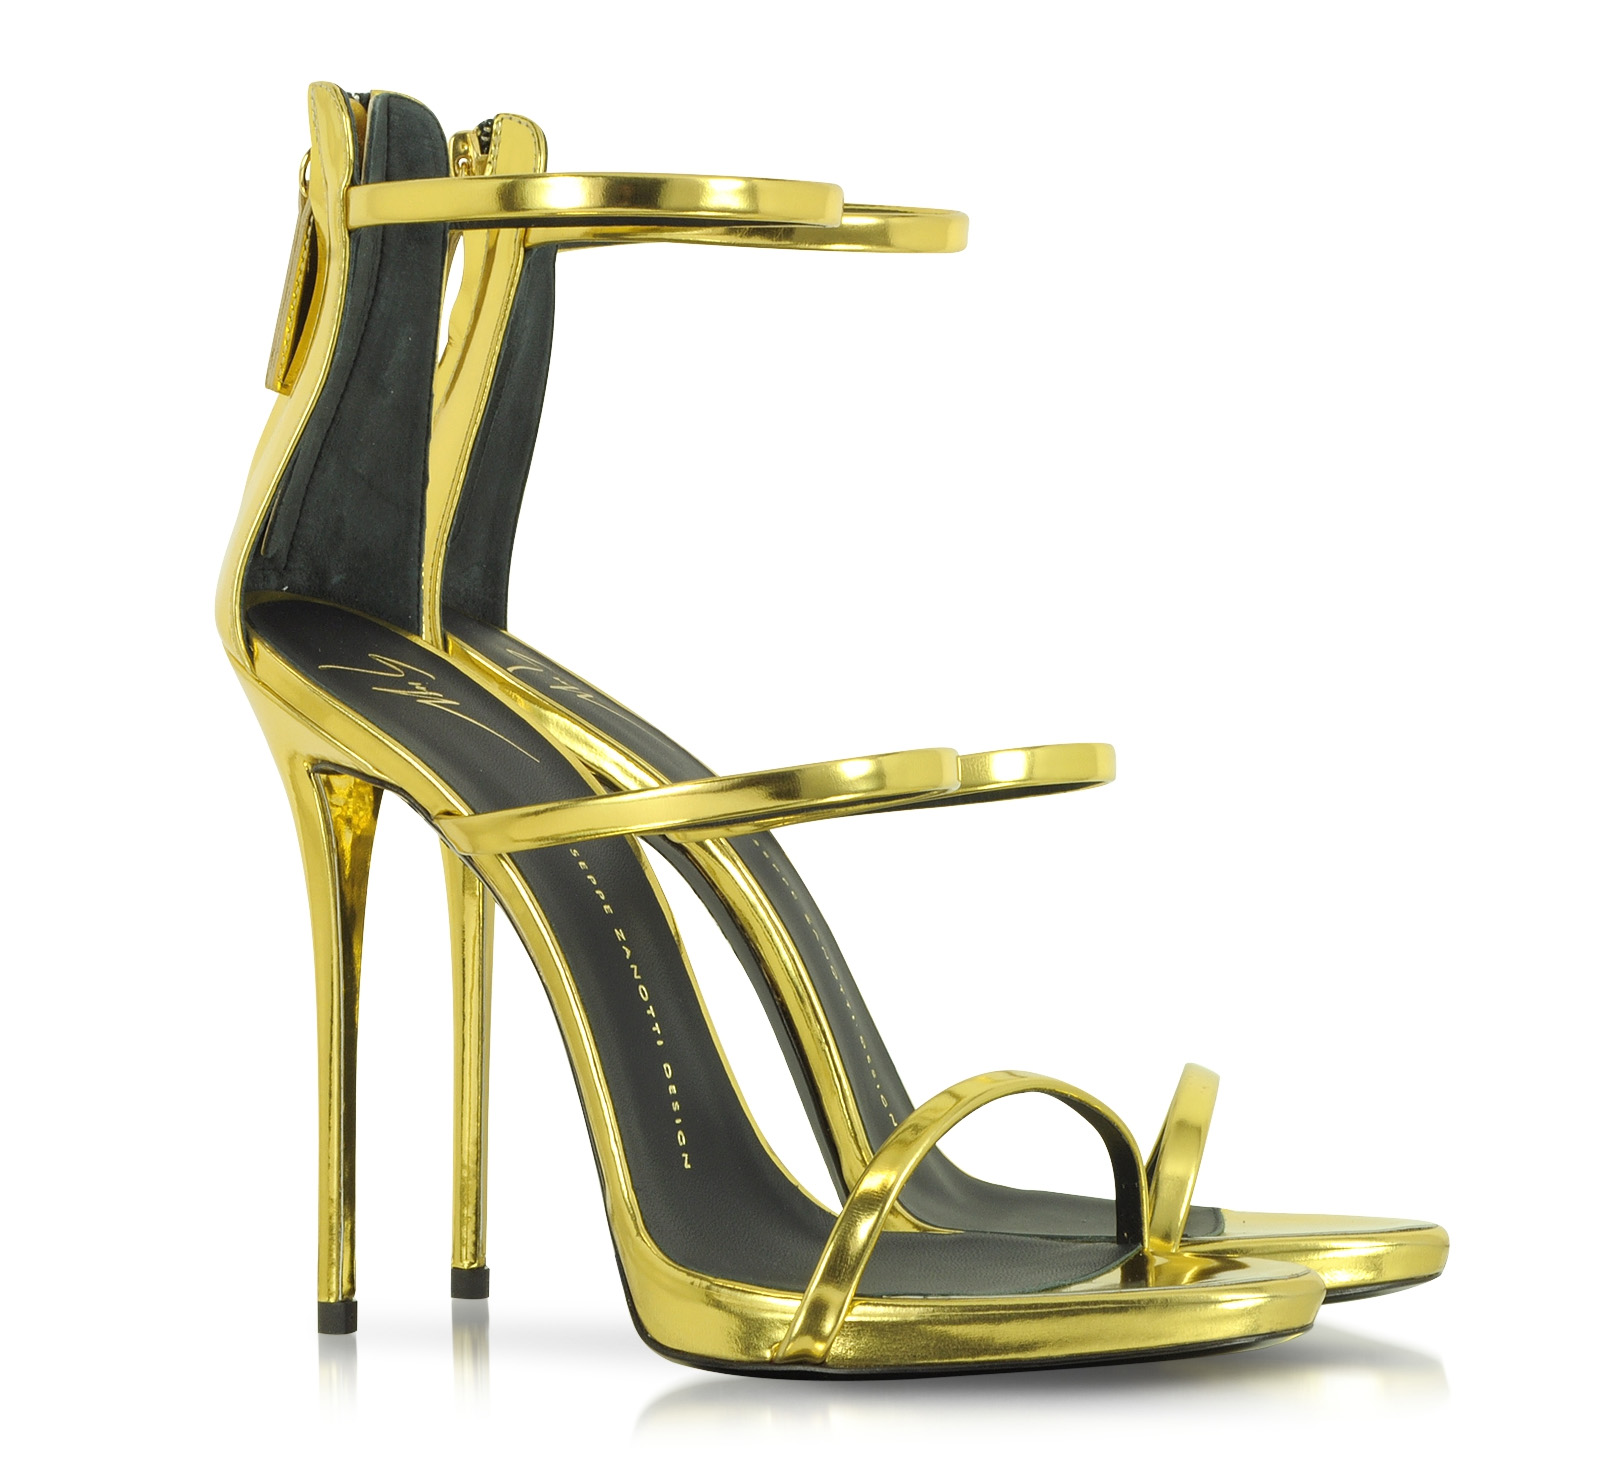 Giuseppe zanotti gold metallic sandals garden house for Zanotti arredamenti